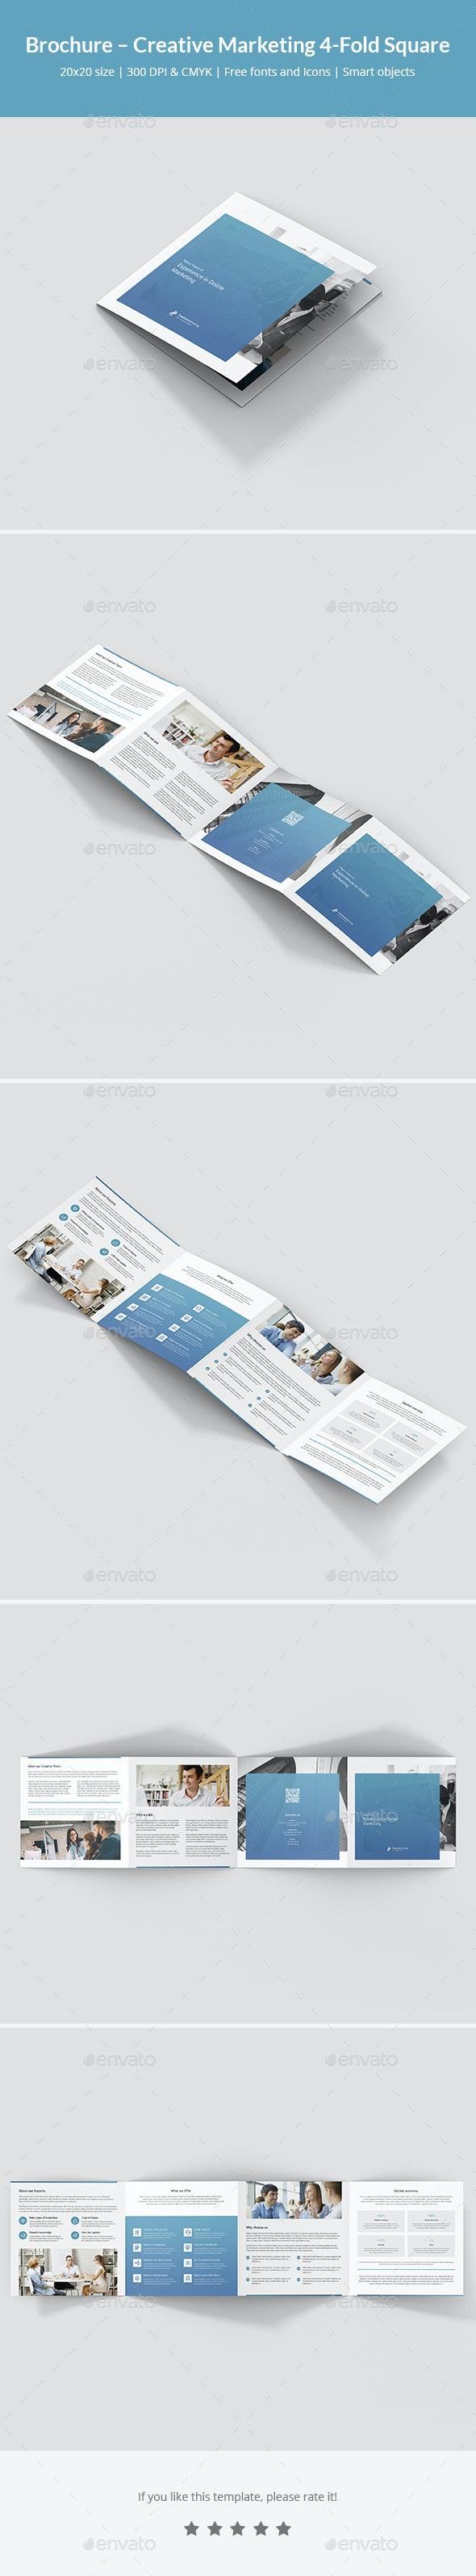 Brochure – Creative Marketing 4-Fold Square - Corporate Brochures